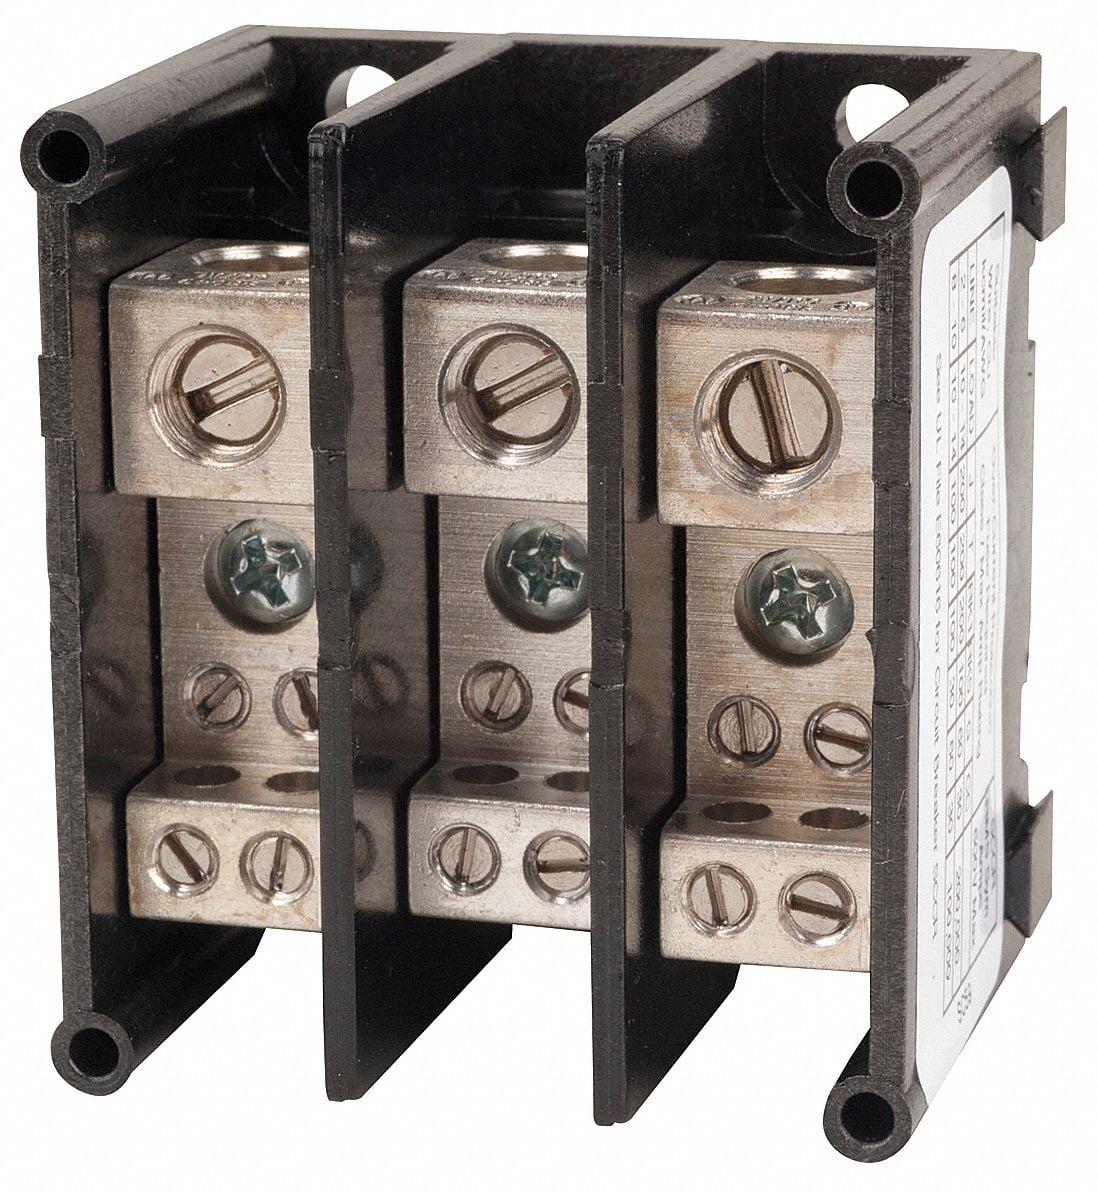 Square D Miniature Distribution Block, 115 Max. Amps, Number of Poles: 3